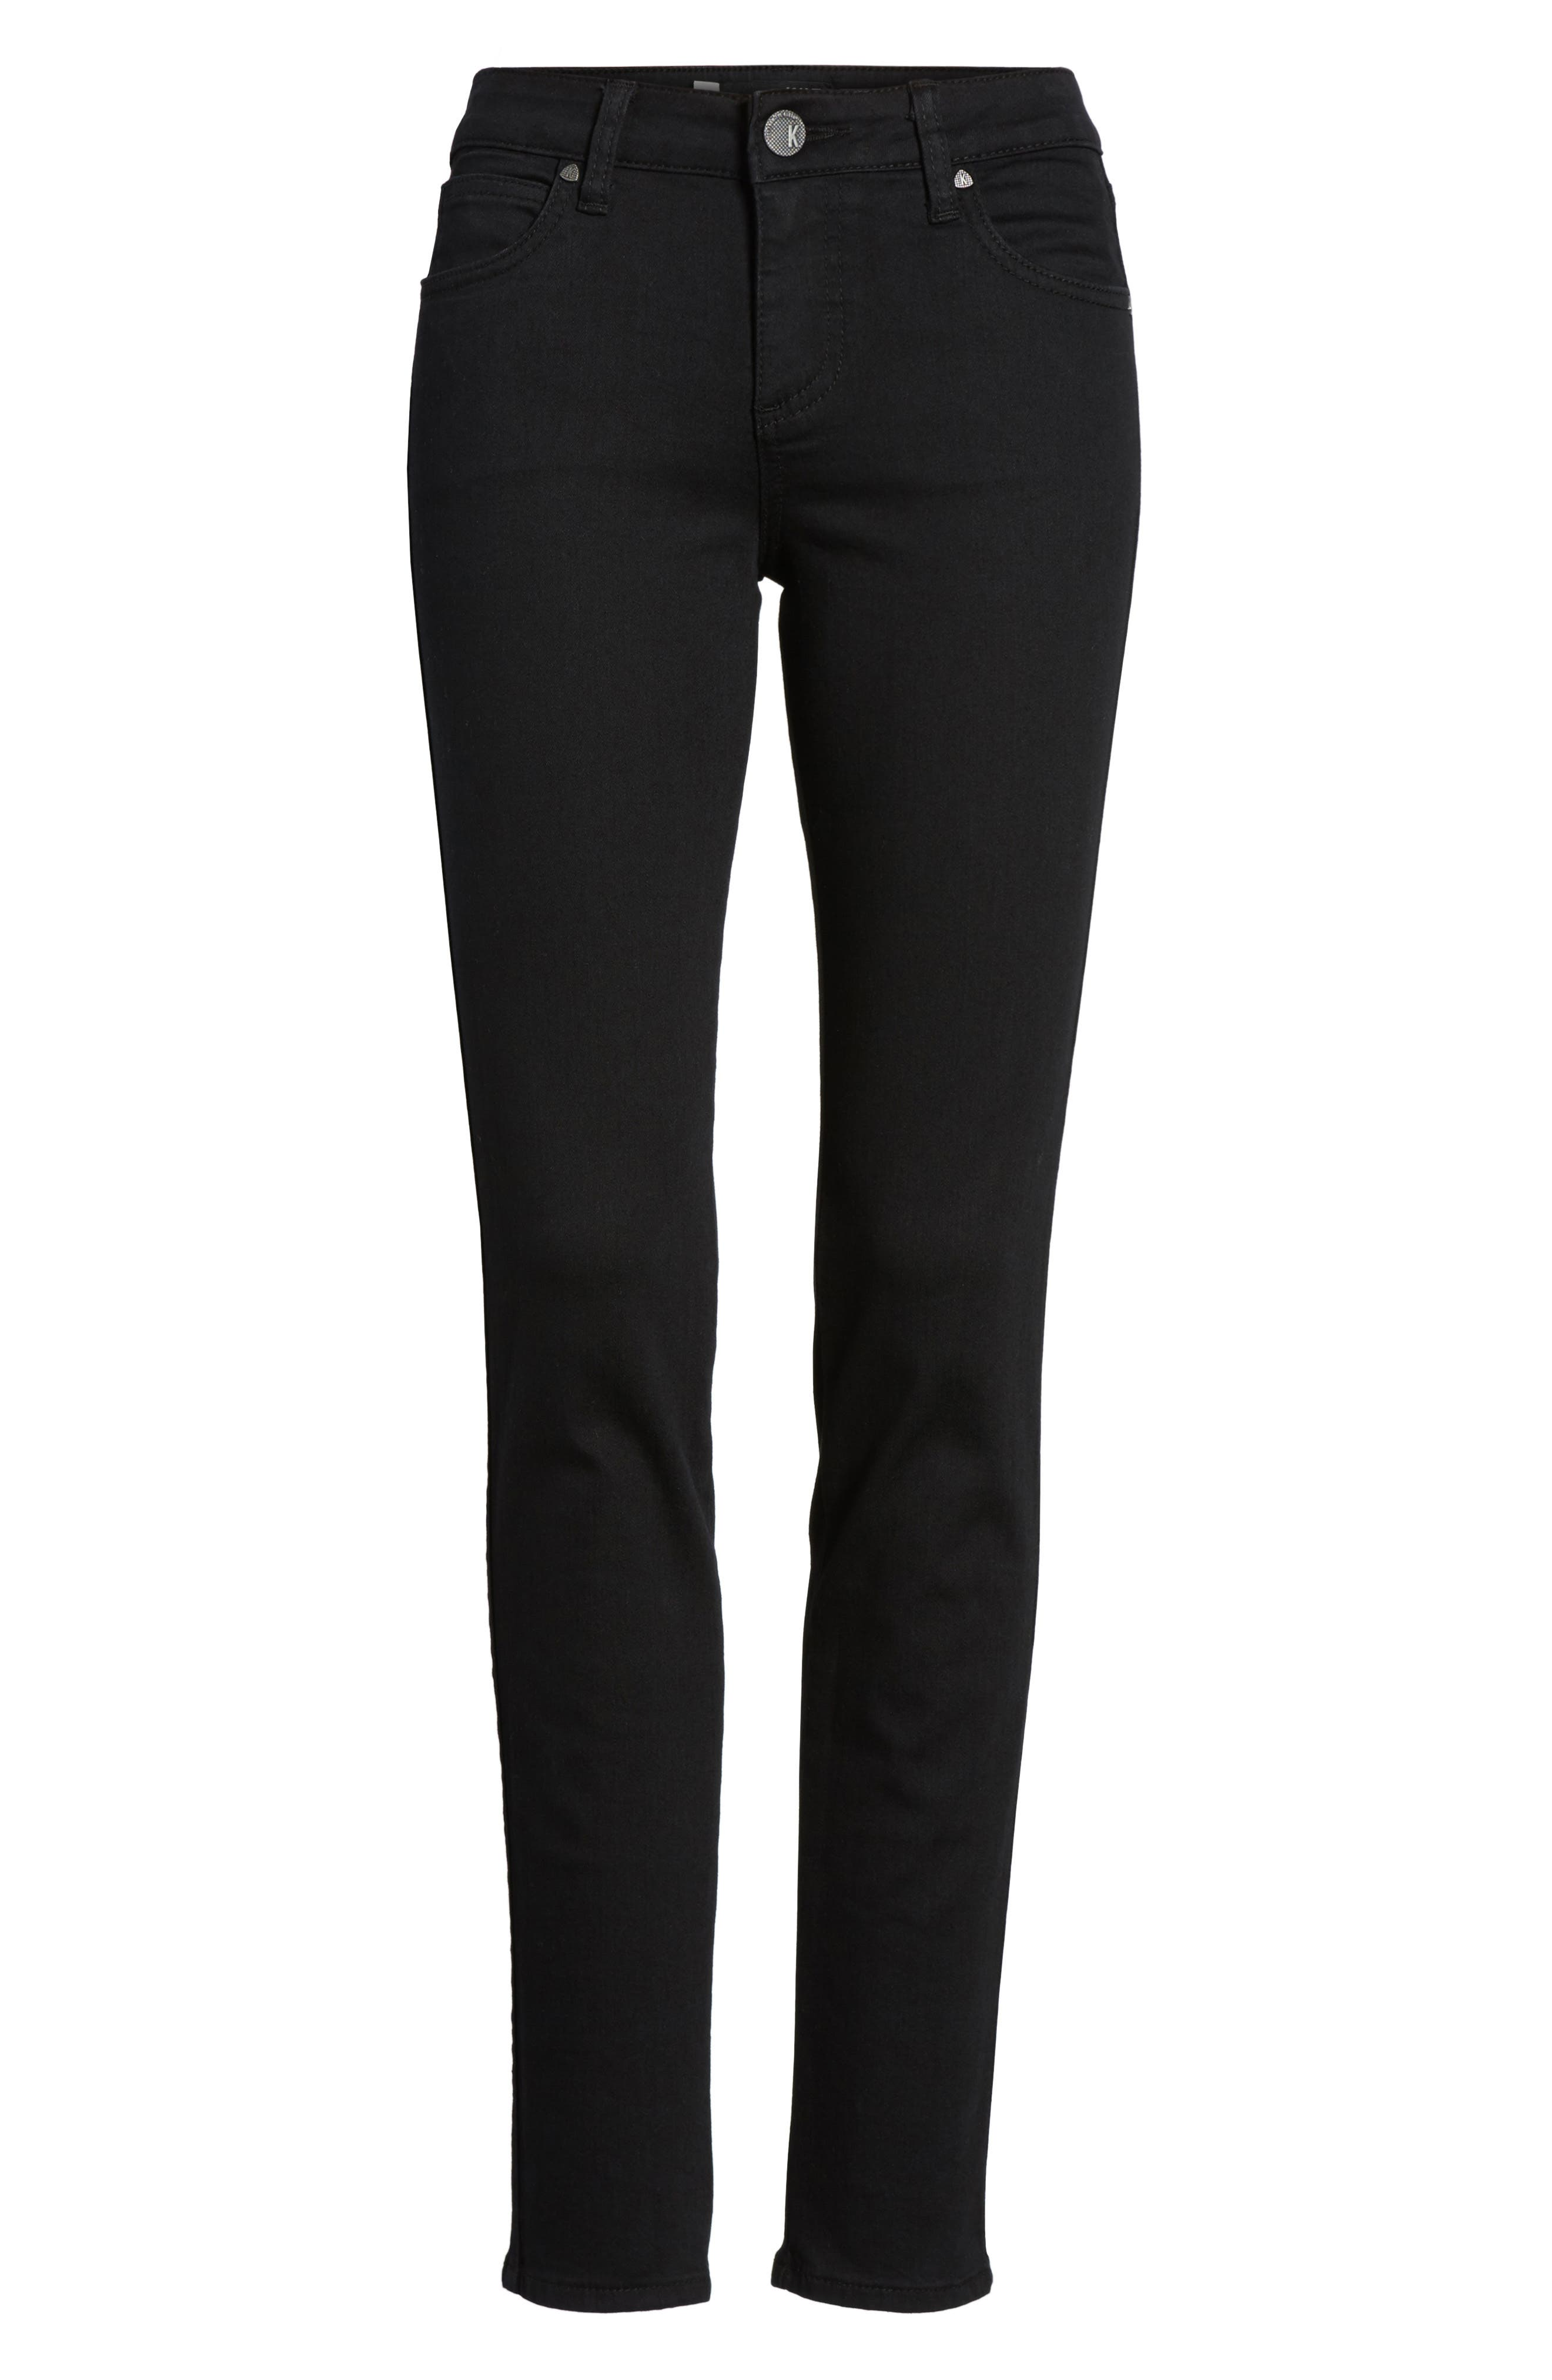 Diana Curvy Fit Skinny Jeans,                             Alternate thumbnail 6, color,                             Black